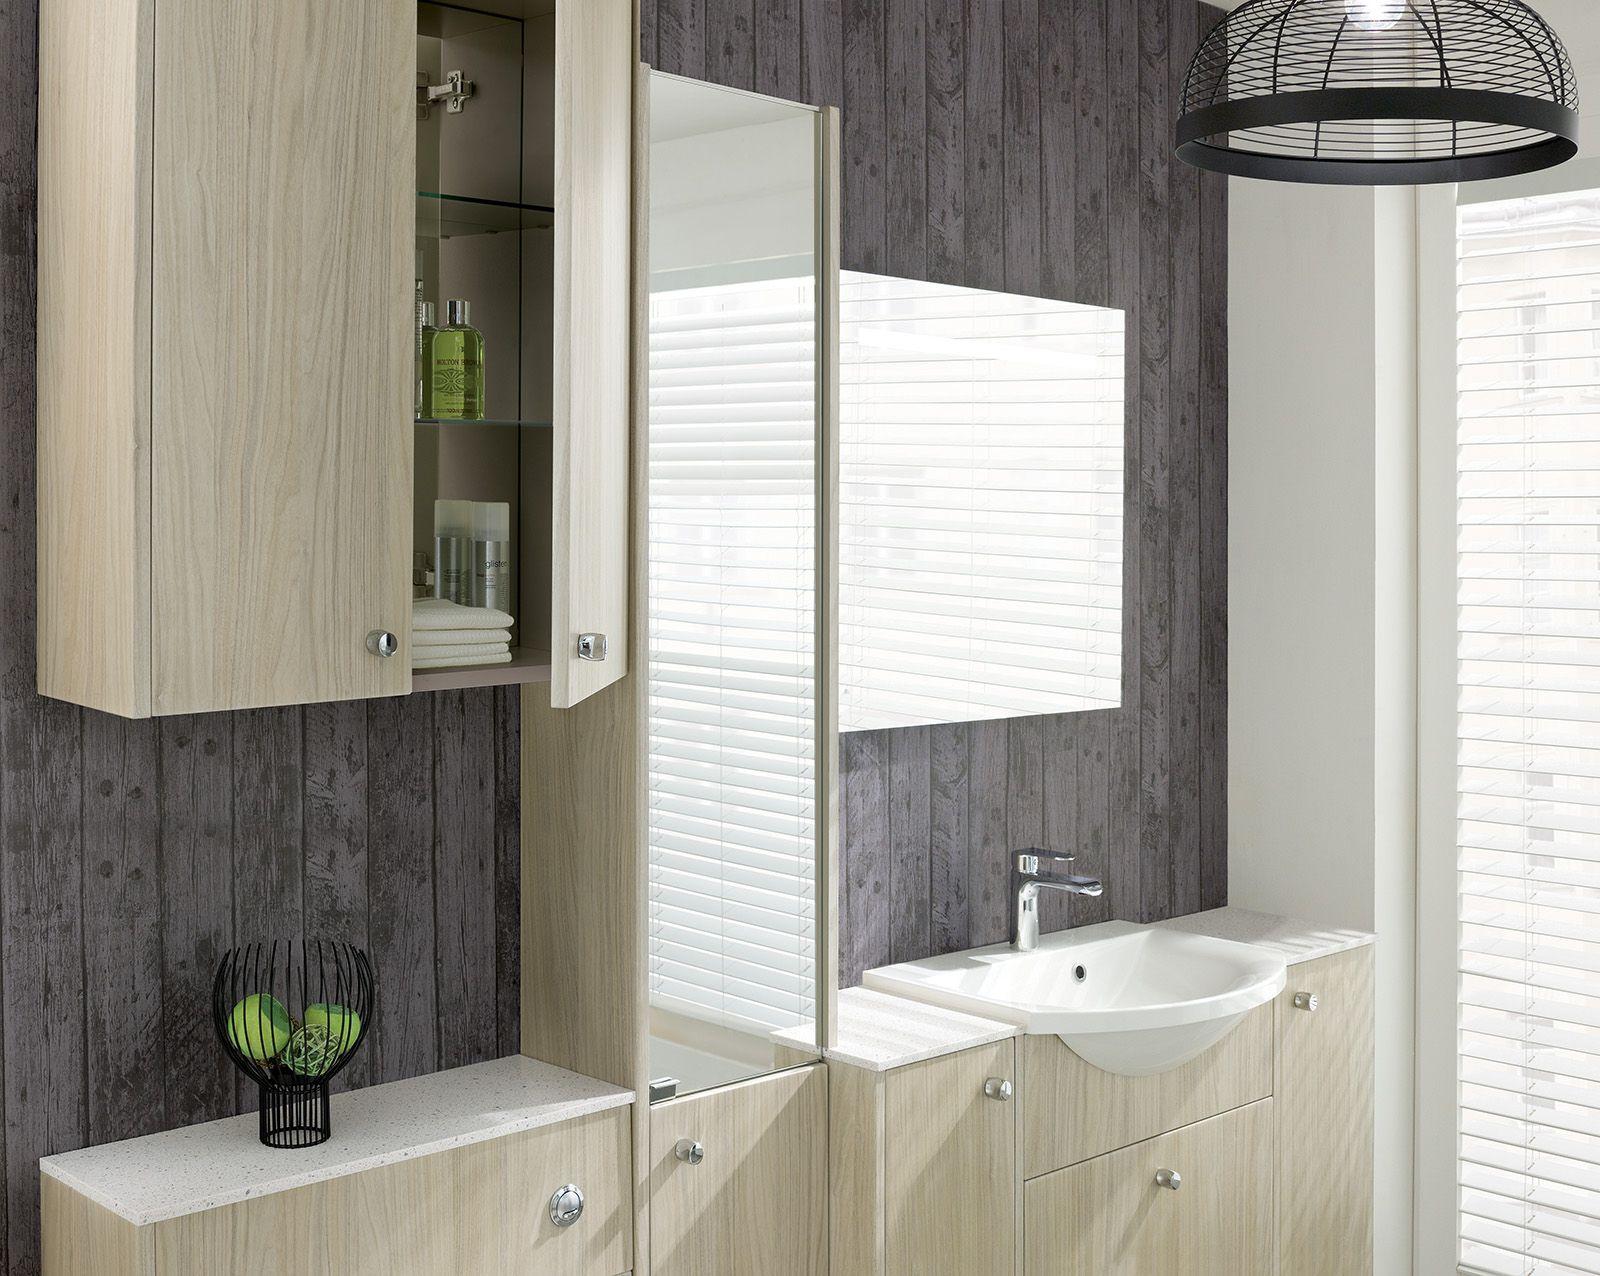 Brecon Washed Walnut Calypso Bathroom Furniture Bathroom